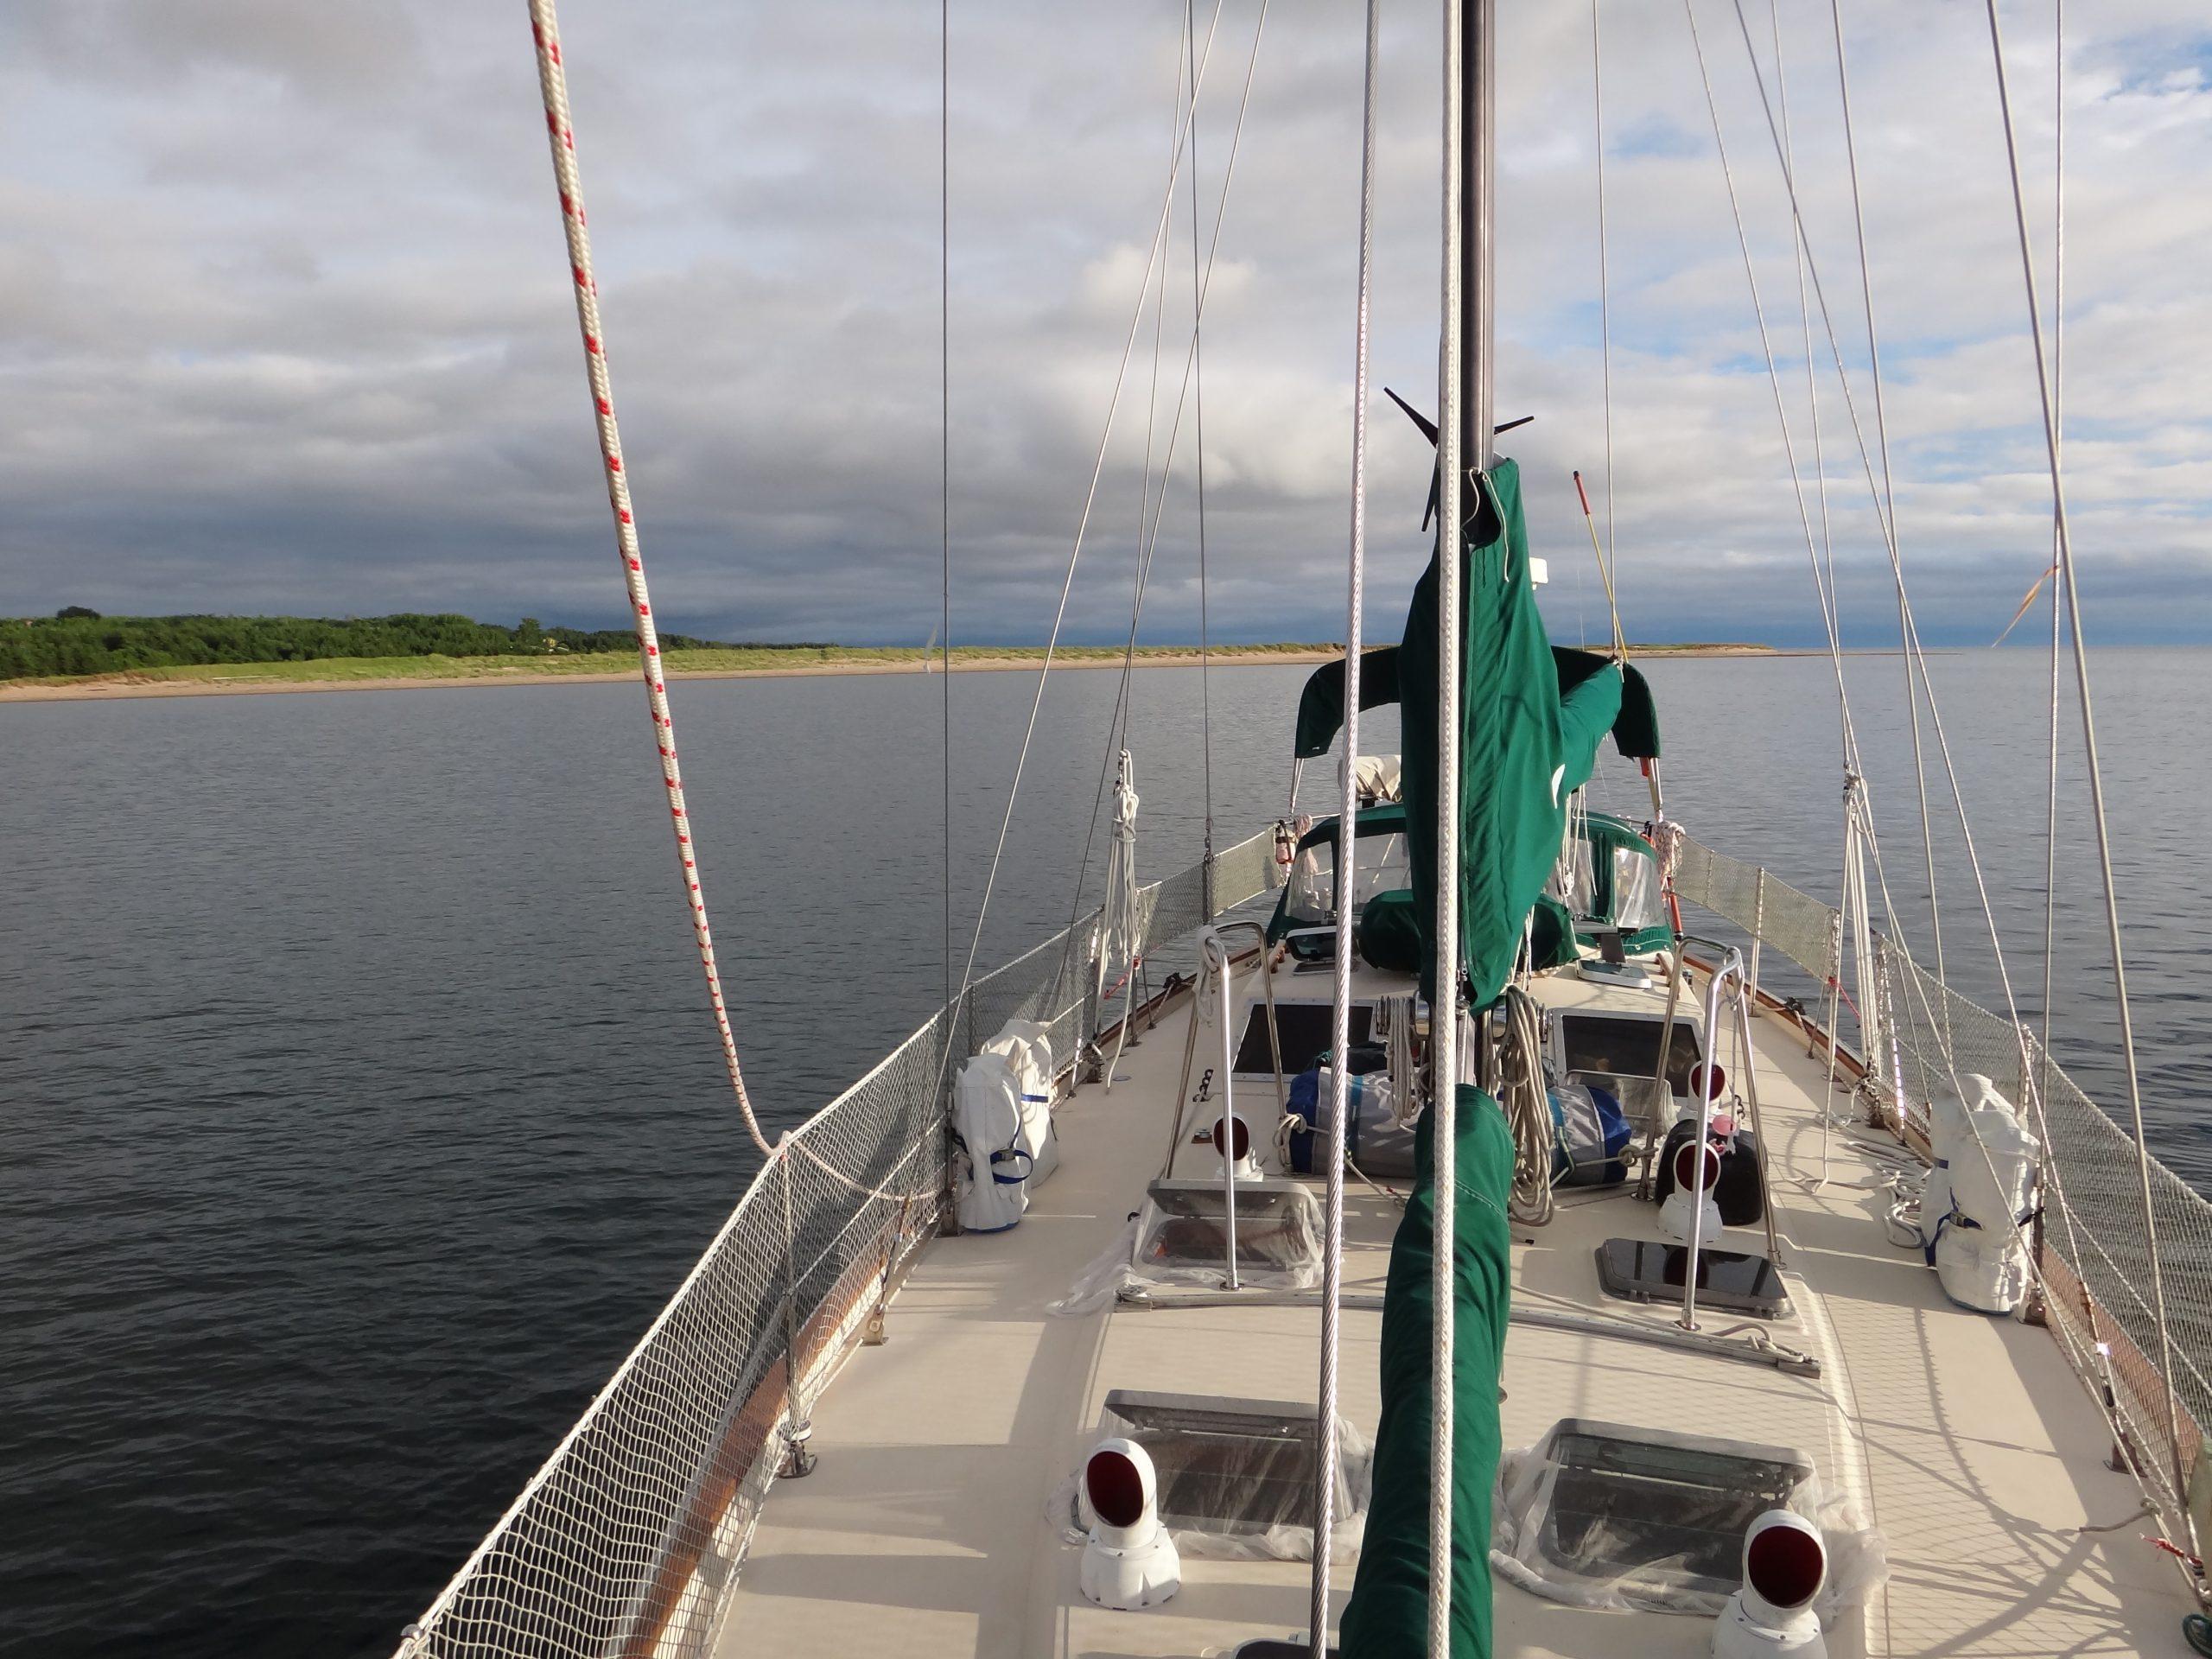 023 - Simmerdim - deck